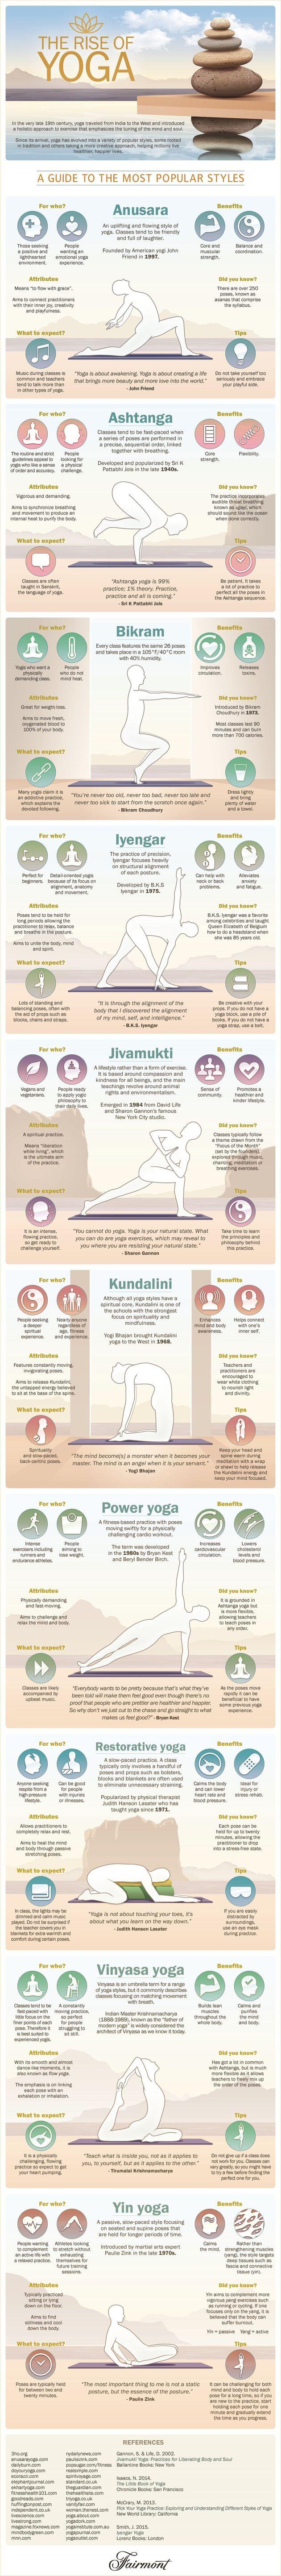 Yoga Styles: How Each Type